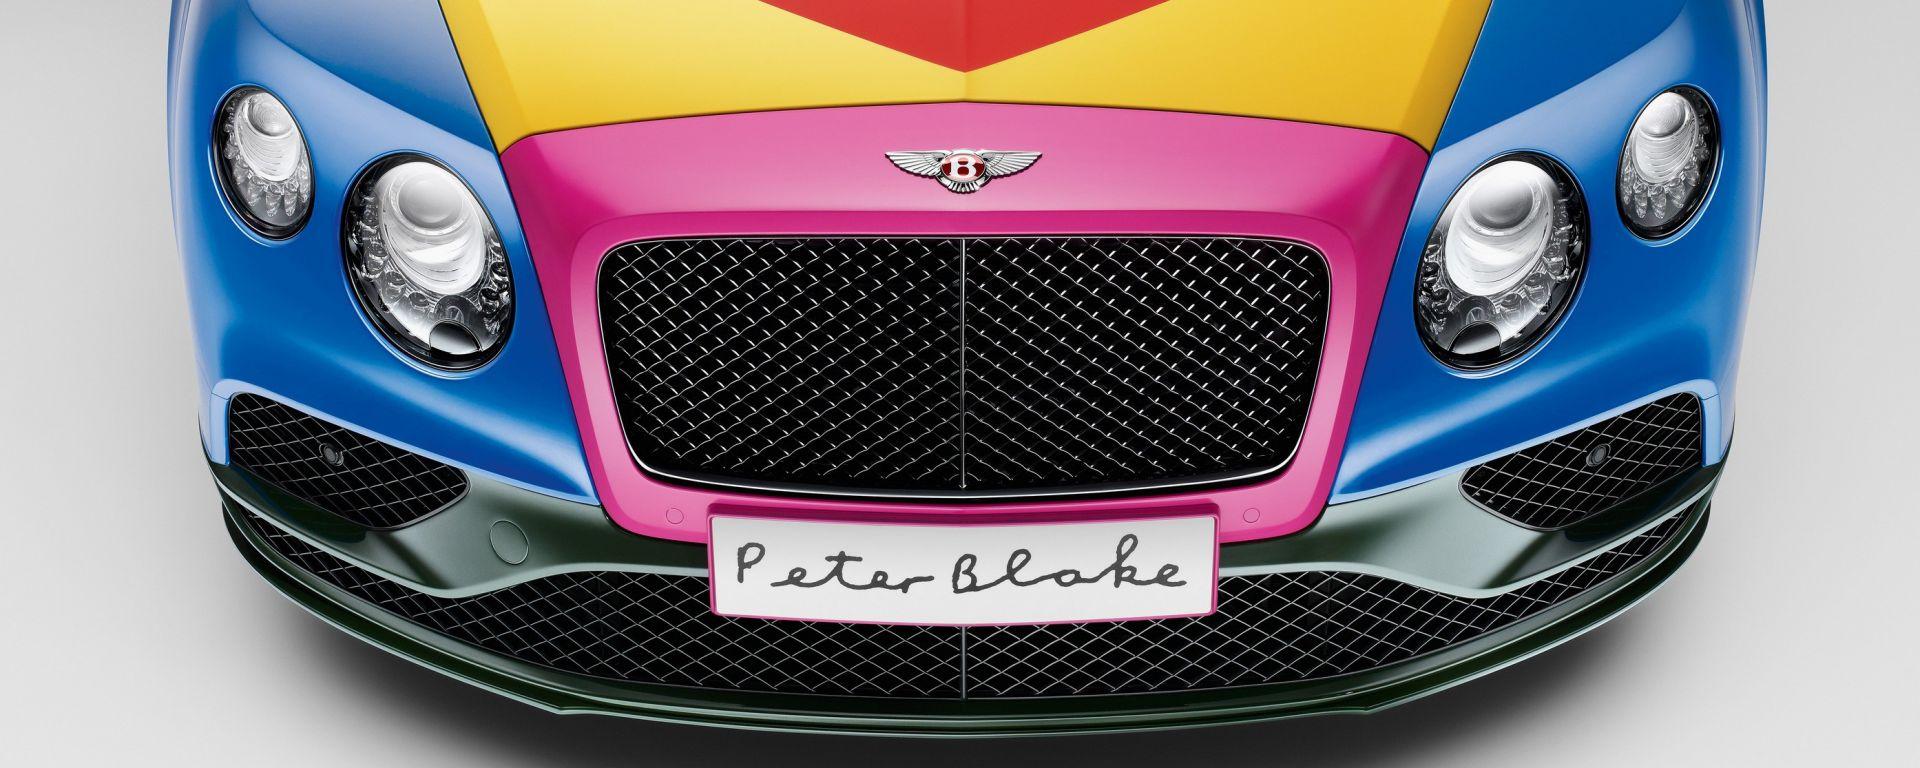 Bentley Continental GT V8 S Convertible pop art